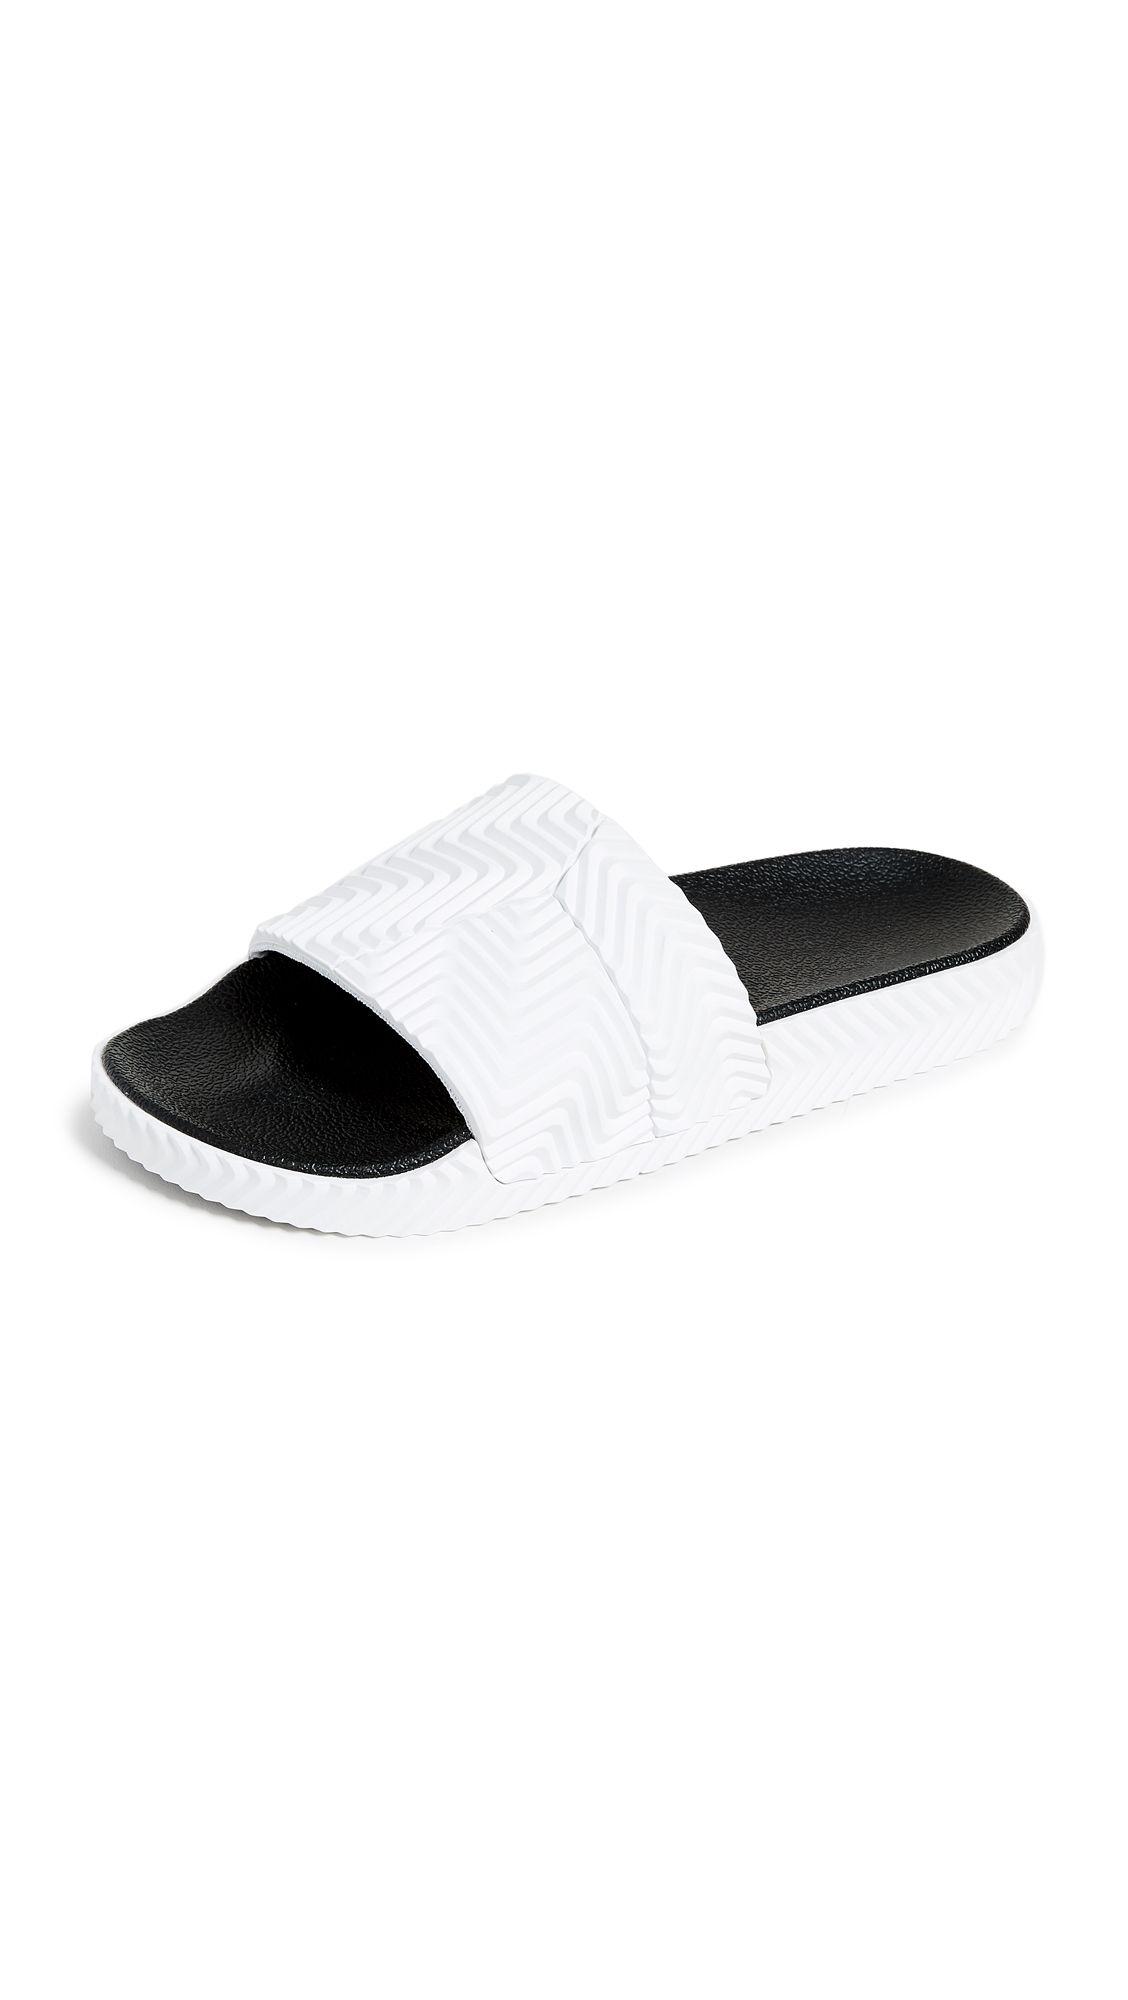 18b2981a9 ADIDAS ORIGINALS BY ALEXANDER WANG ADILETTE SLIDES.  #adidasoriginalsbyalexanderwang #shoes #